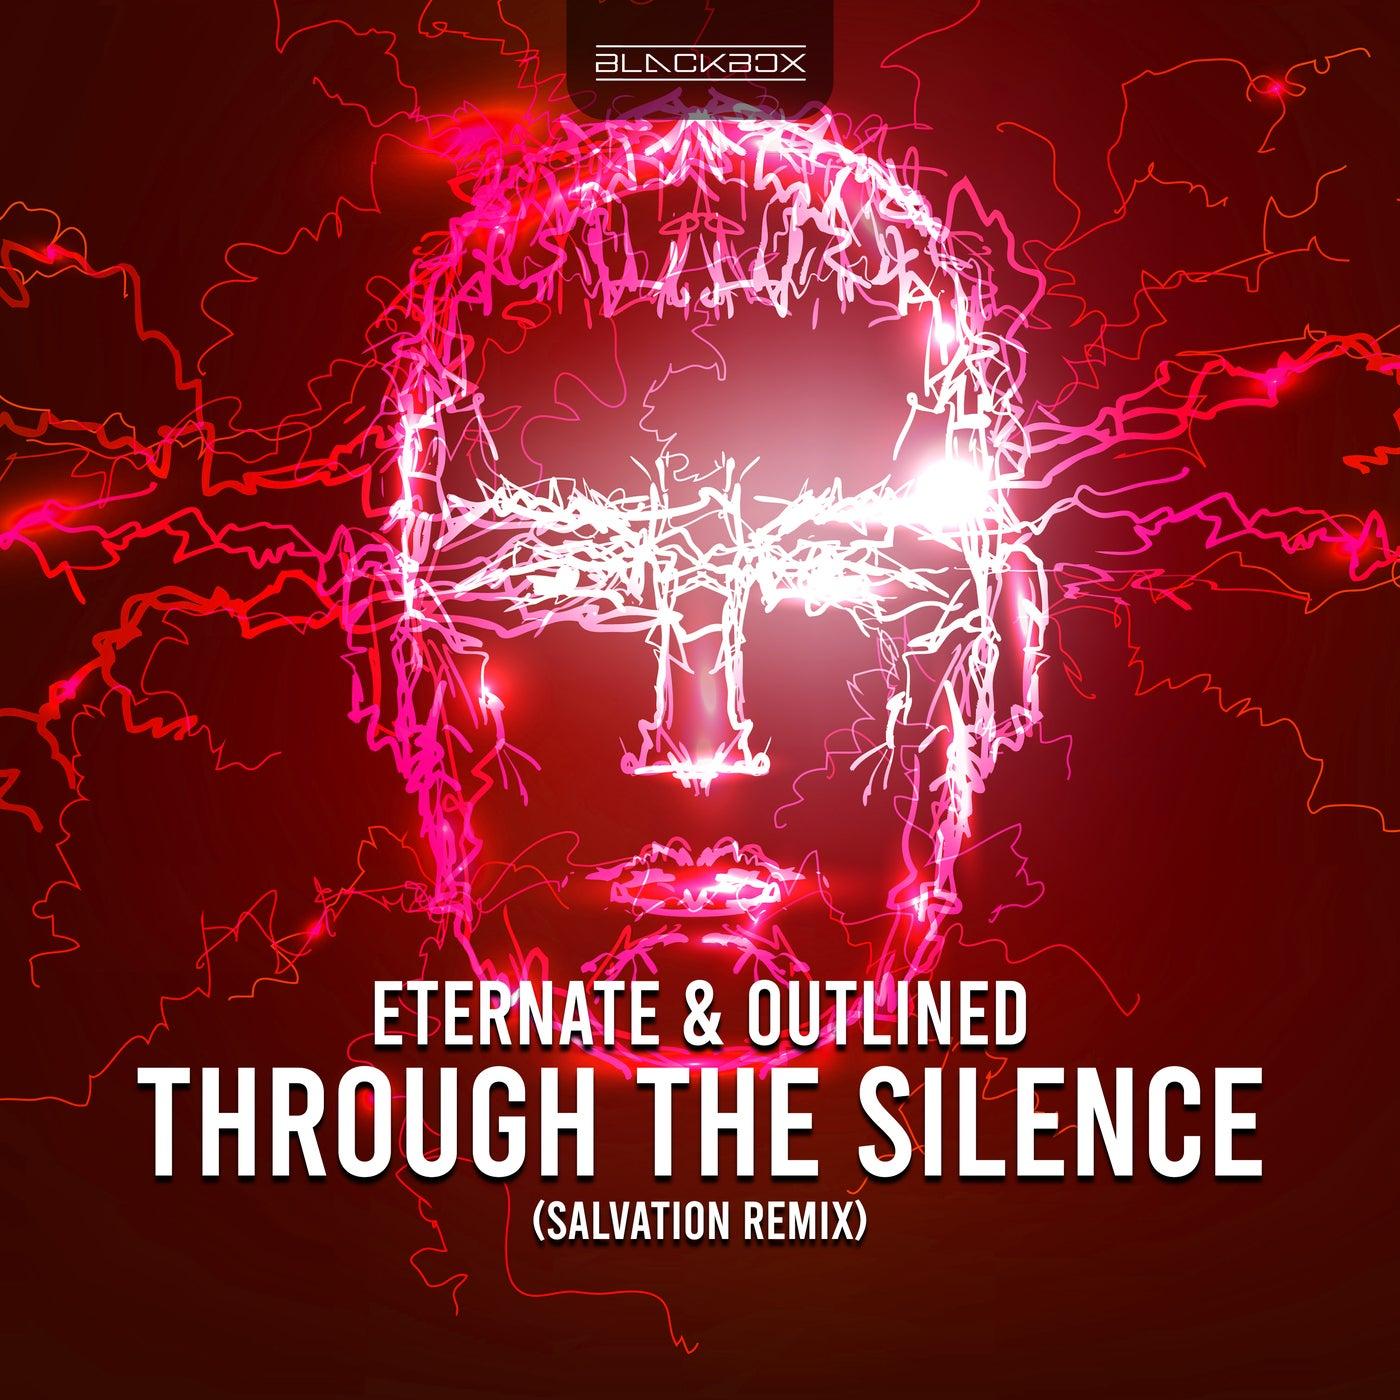 Through The Silence (Salvation Remix)